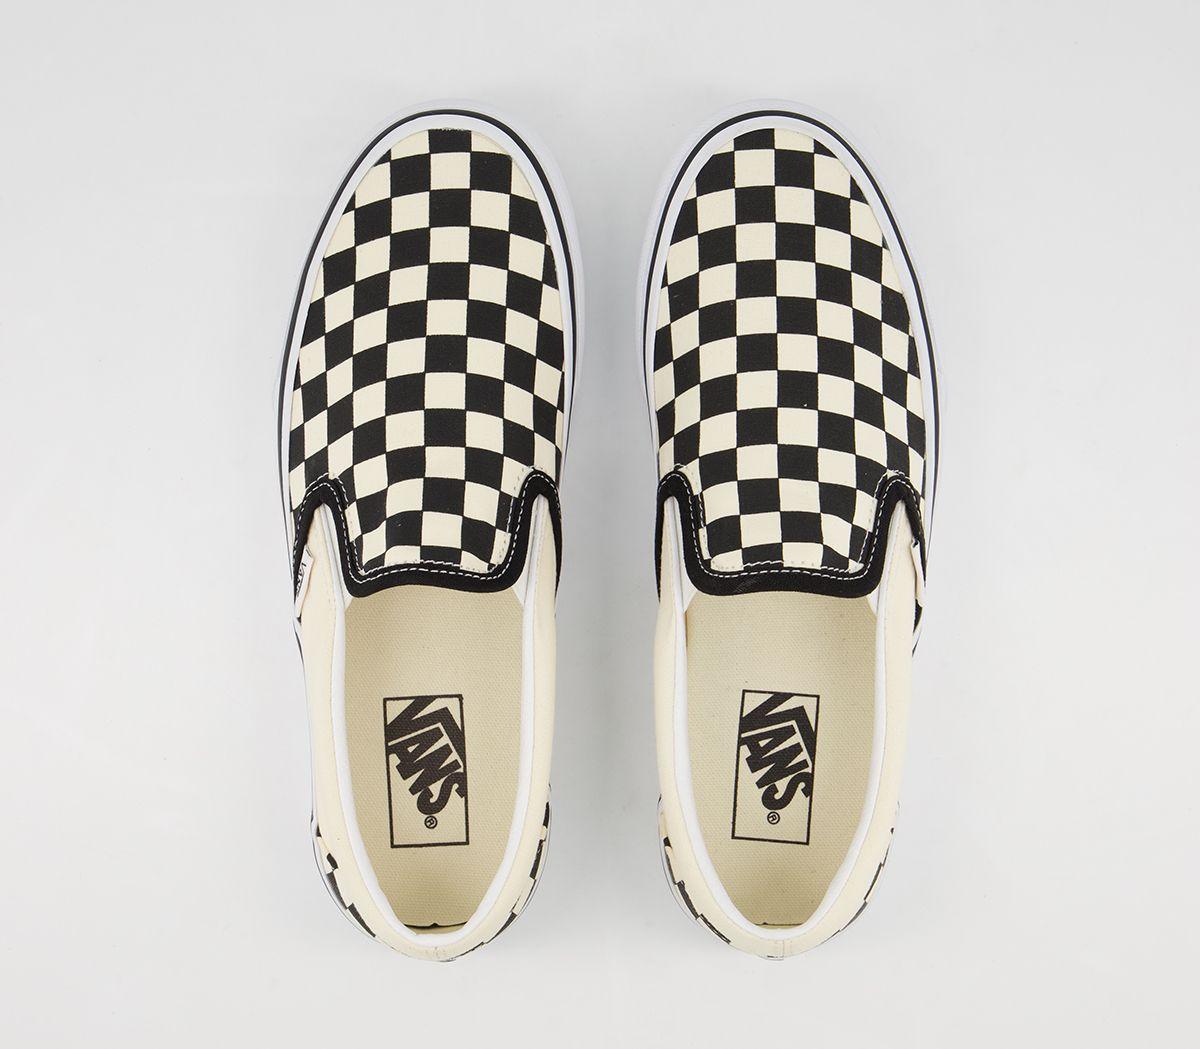 28c4a851927dbf Vans Classic Slip On Platform Trainers Black White Checker - Hers ...